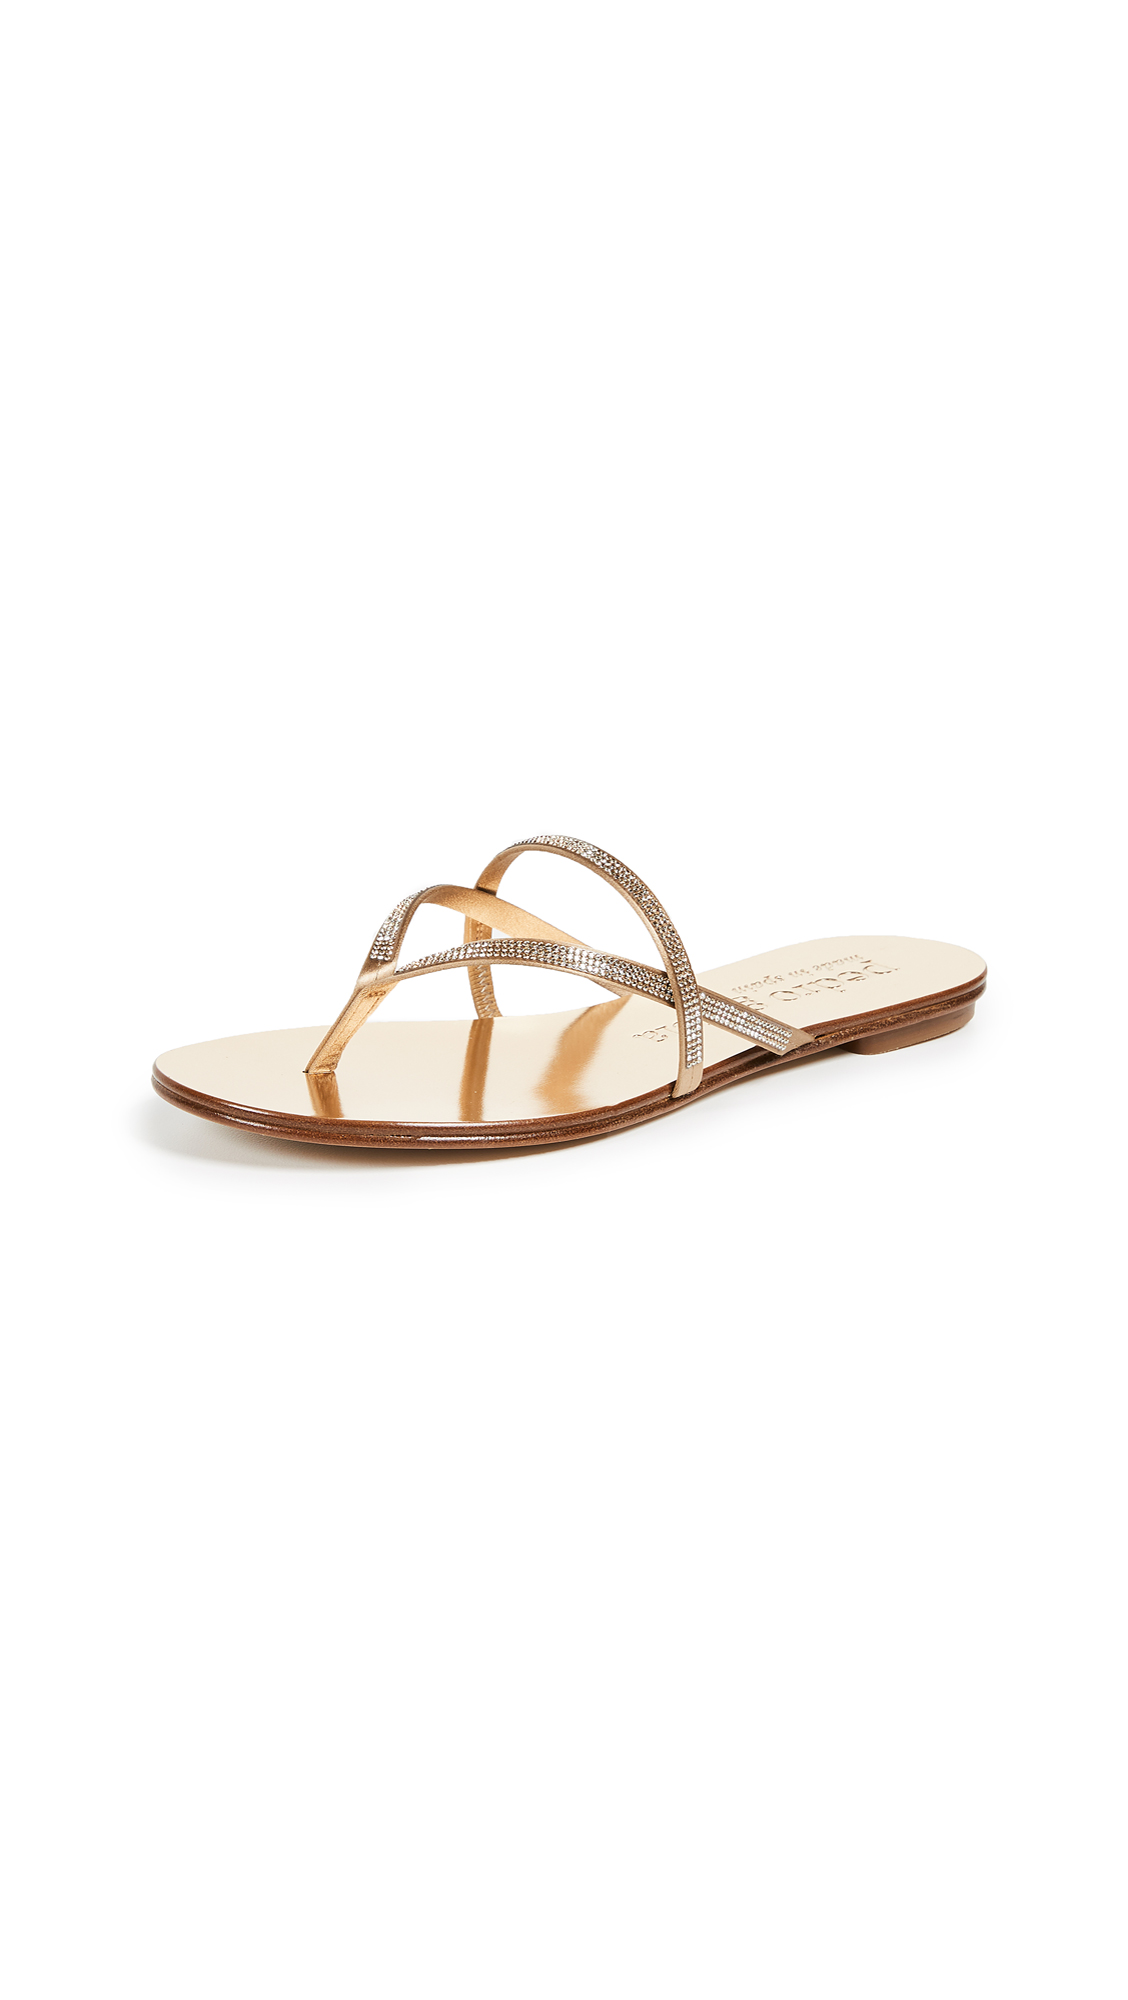 Pedro Garcia Sosie Thong Sandals - Ore